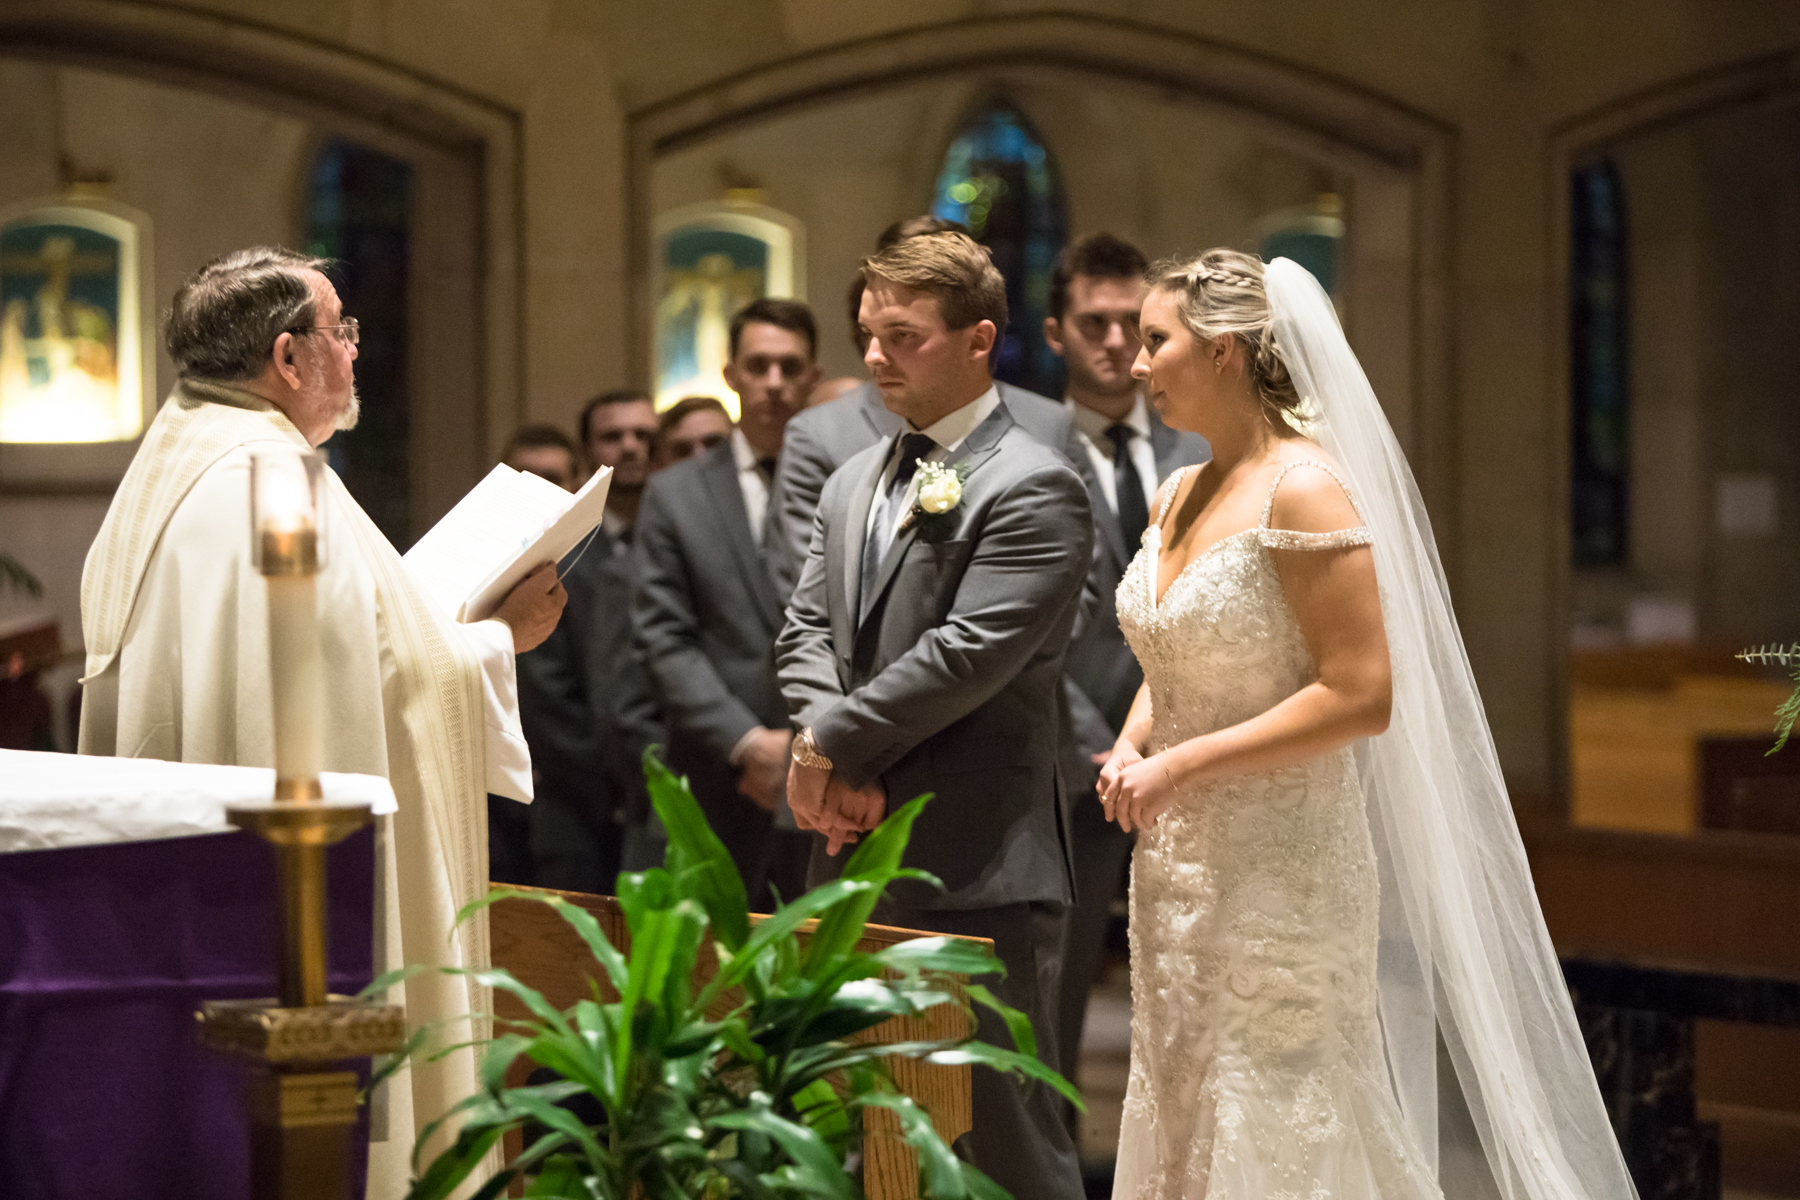 Kelli-and-Matt-Nashville-Wedding-Sneak-Peak-0240.jpg